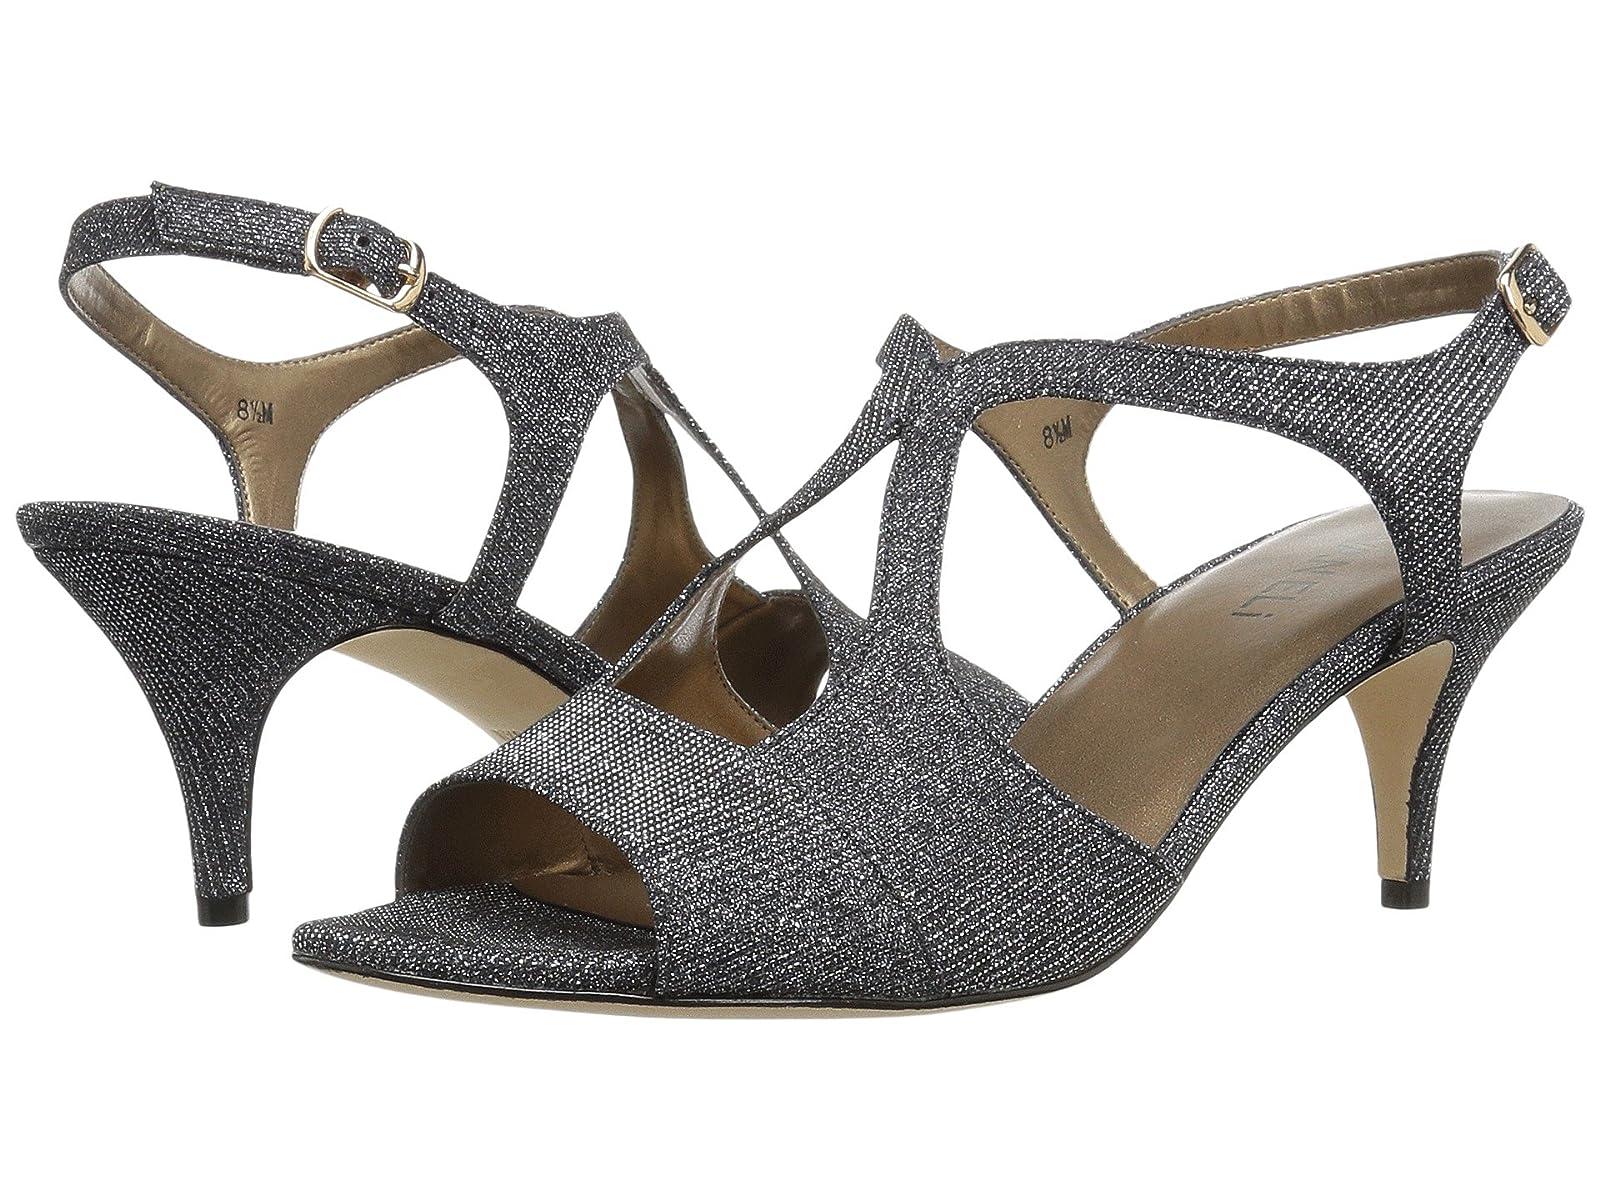 Vaneli LeonieCheap and distinctive eye-catching shoes